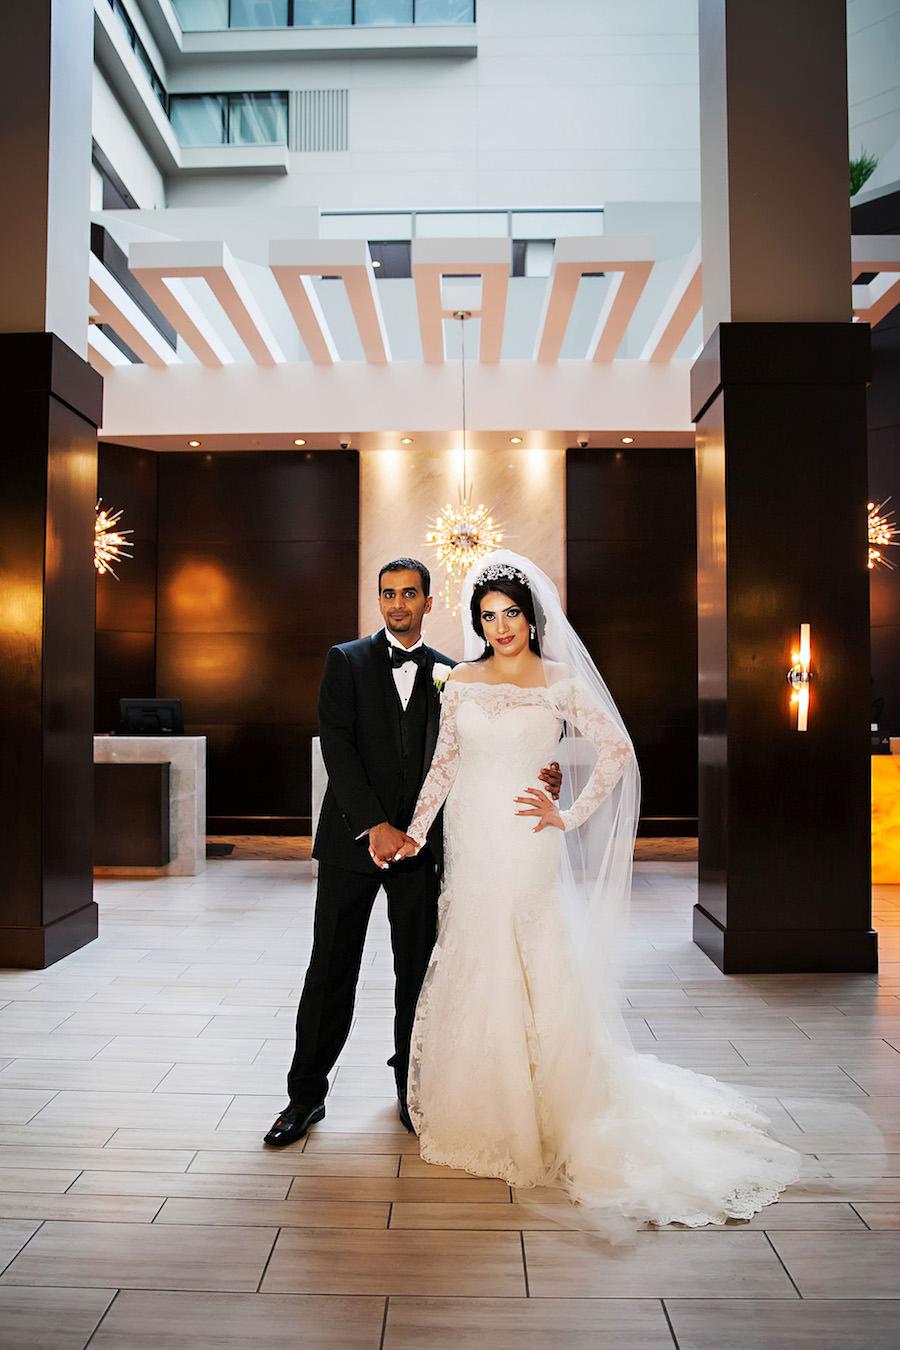 Elegant Indian Bride and Groom Wedding Portrait | Downtown Tampa Hotel Wedding Venue Hilton Downtown | Wedding Photographer Limelight Photography